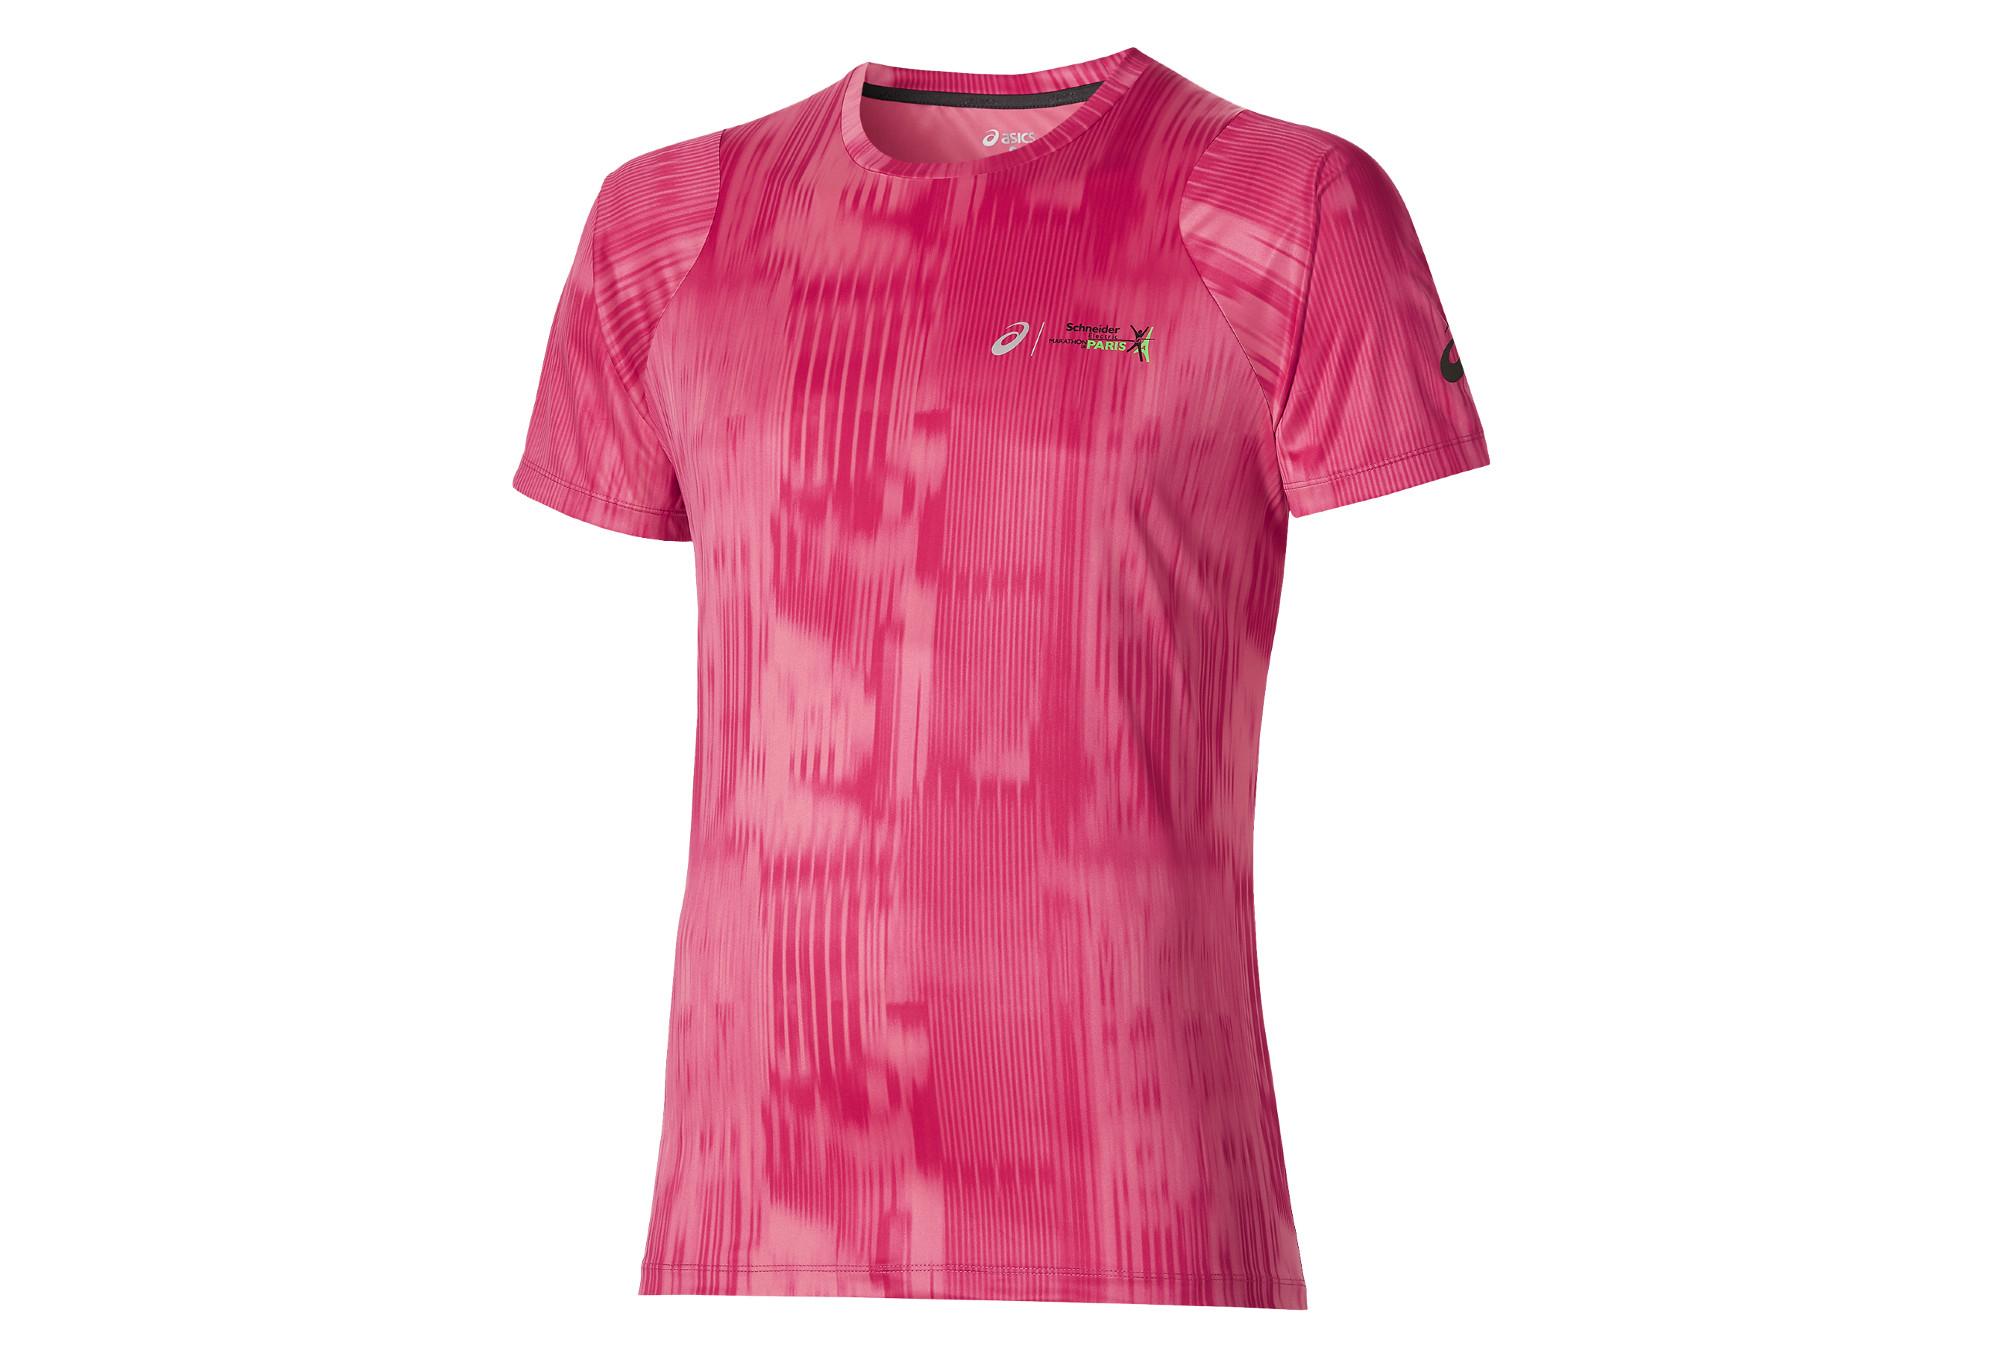 Asics t shirt fuzex printed schneider marathon de paris for Marathon t shirt printing